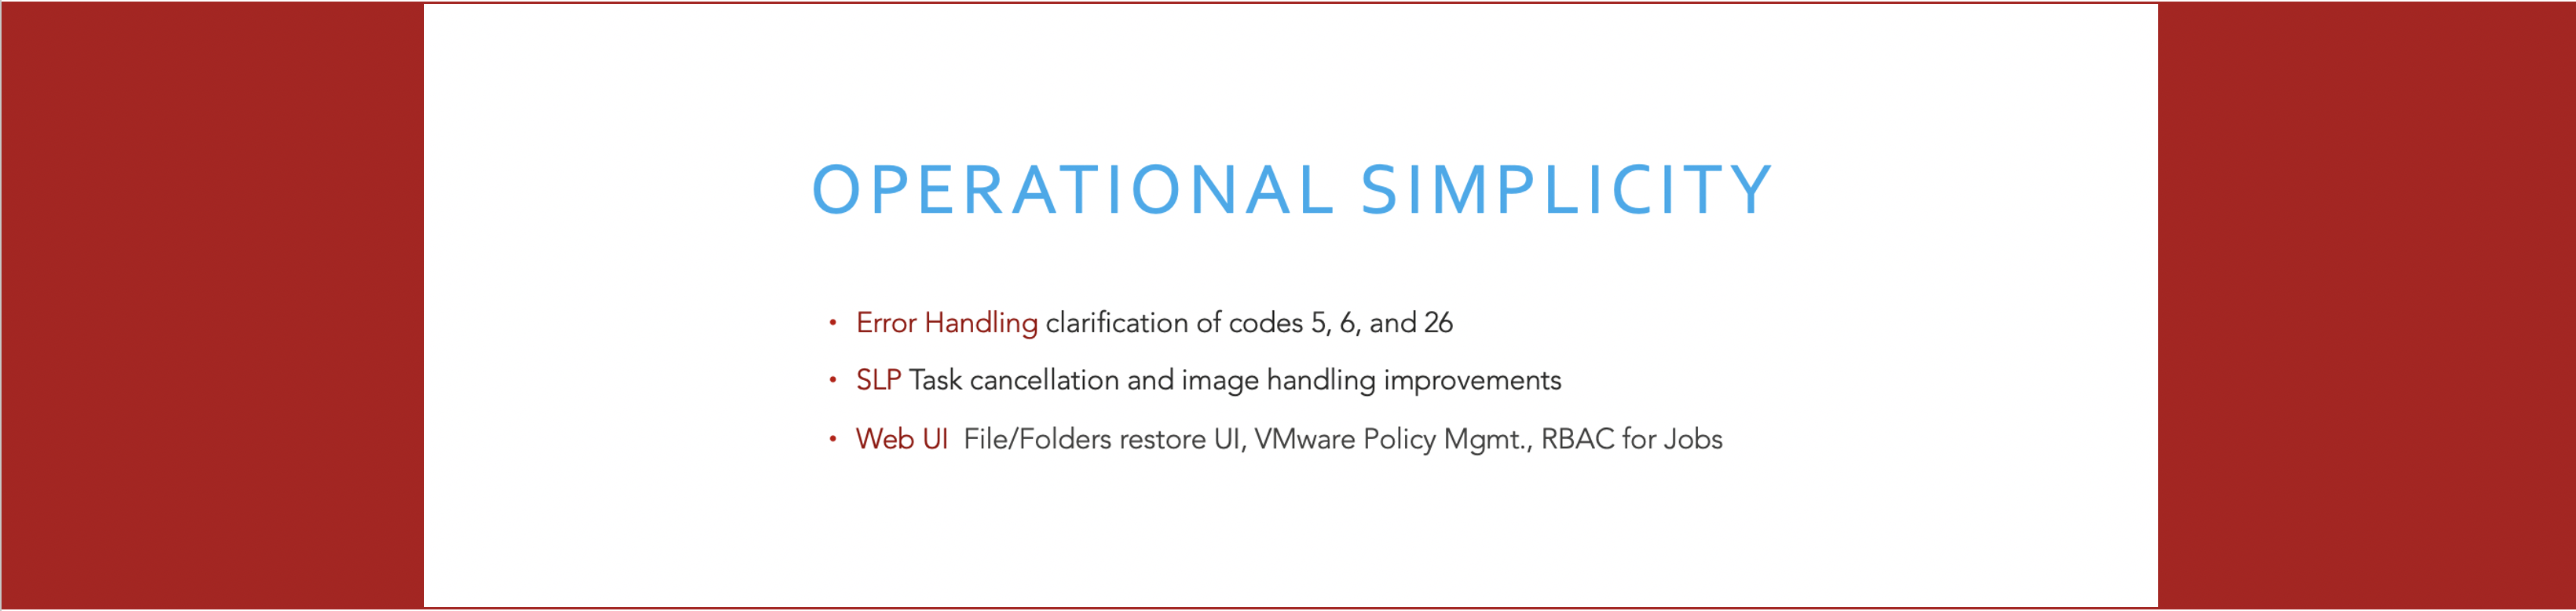 Feature 3 - Operational Simplicity